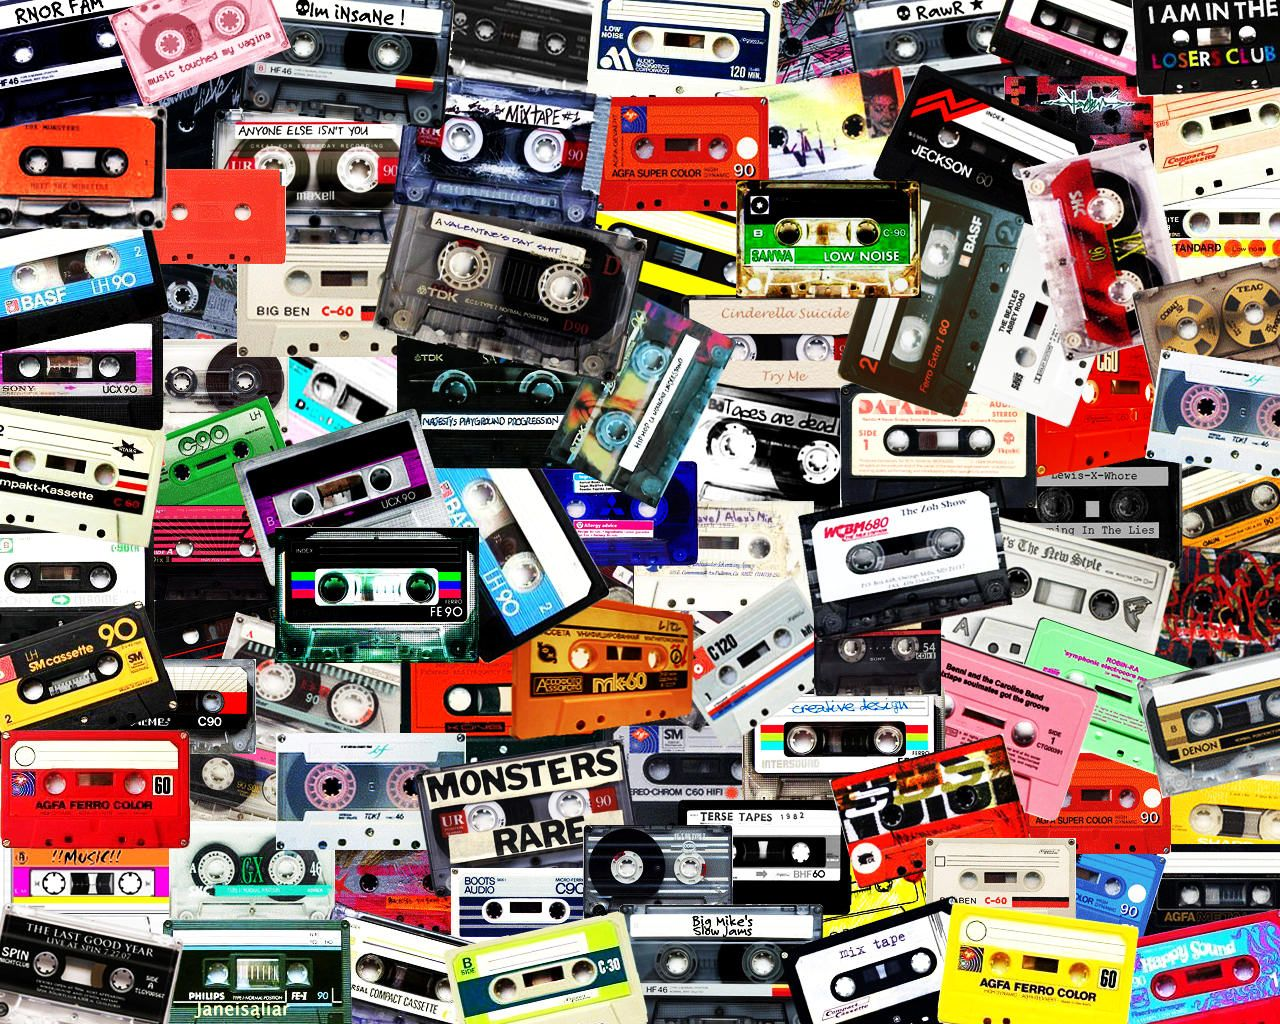 Cassette tapes bob dylan jefferson airplane johnny cash